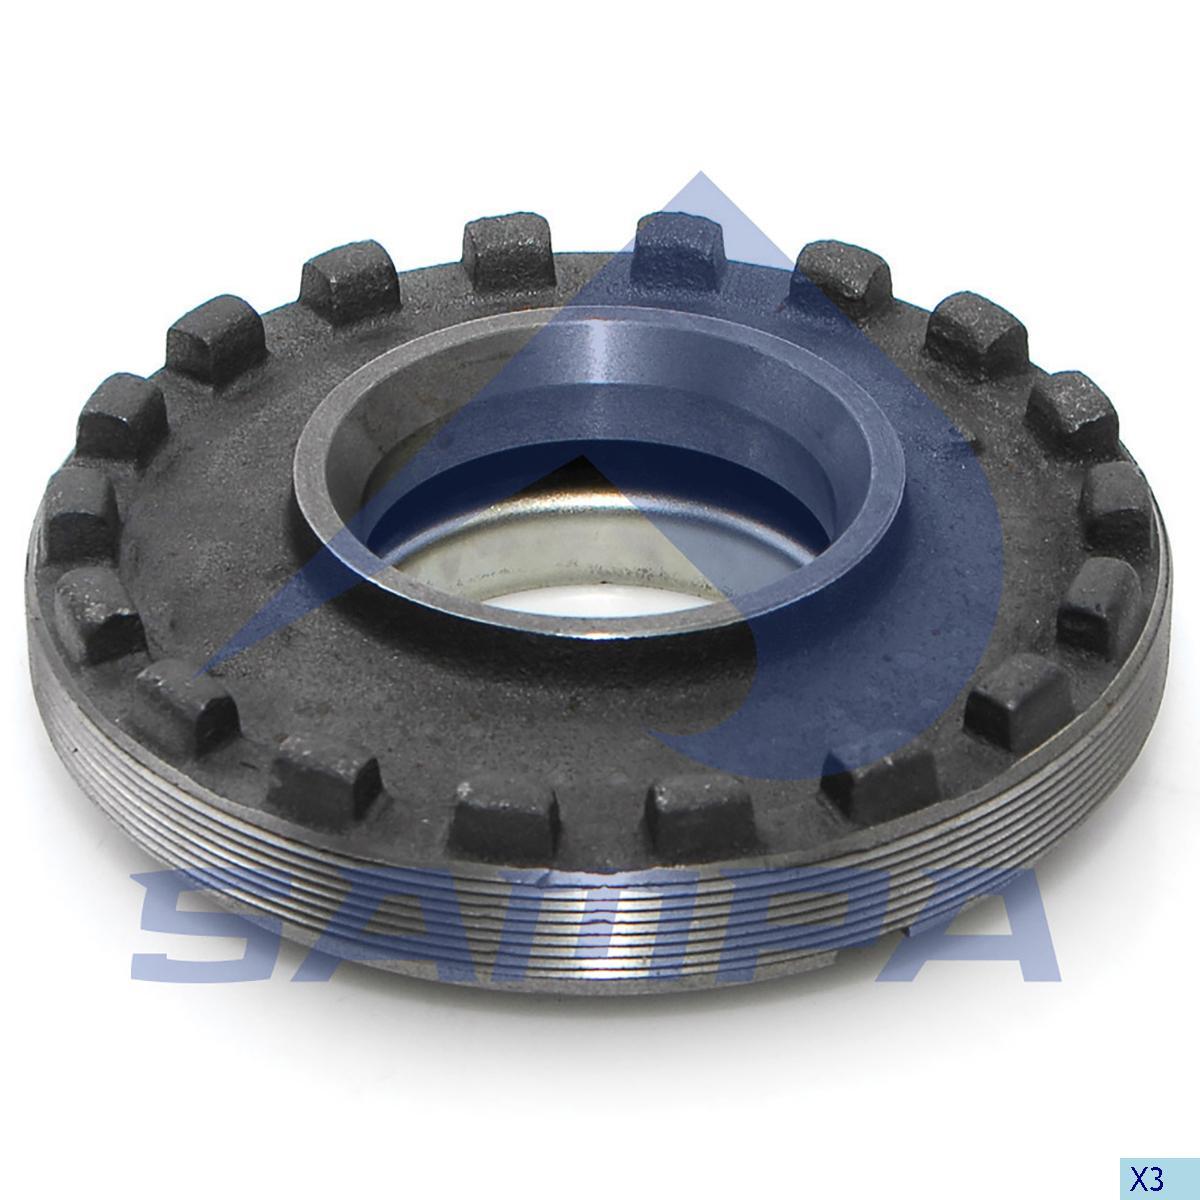 Adjusting Ring, Drive Shaft, Power Unit